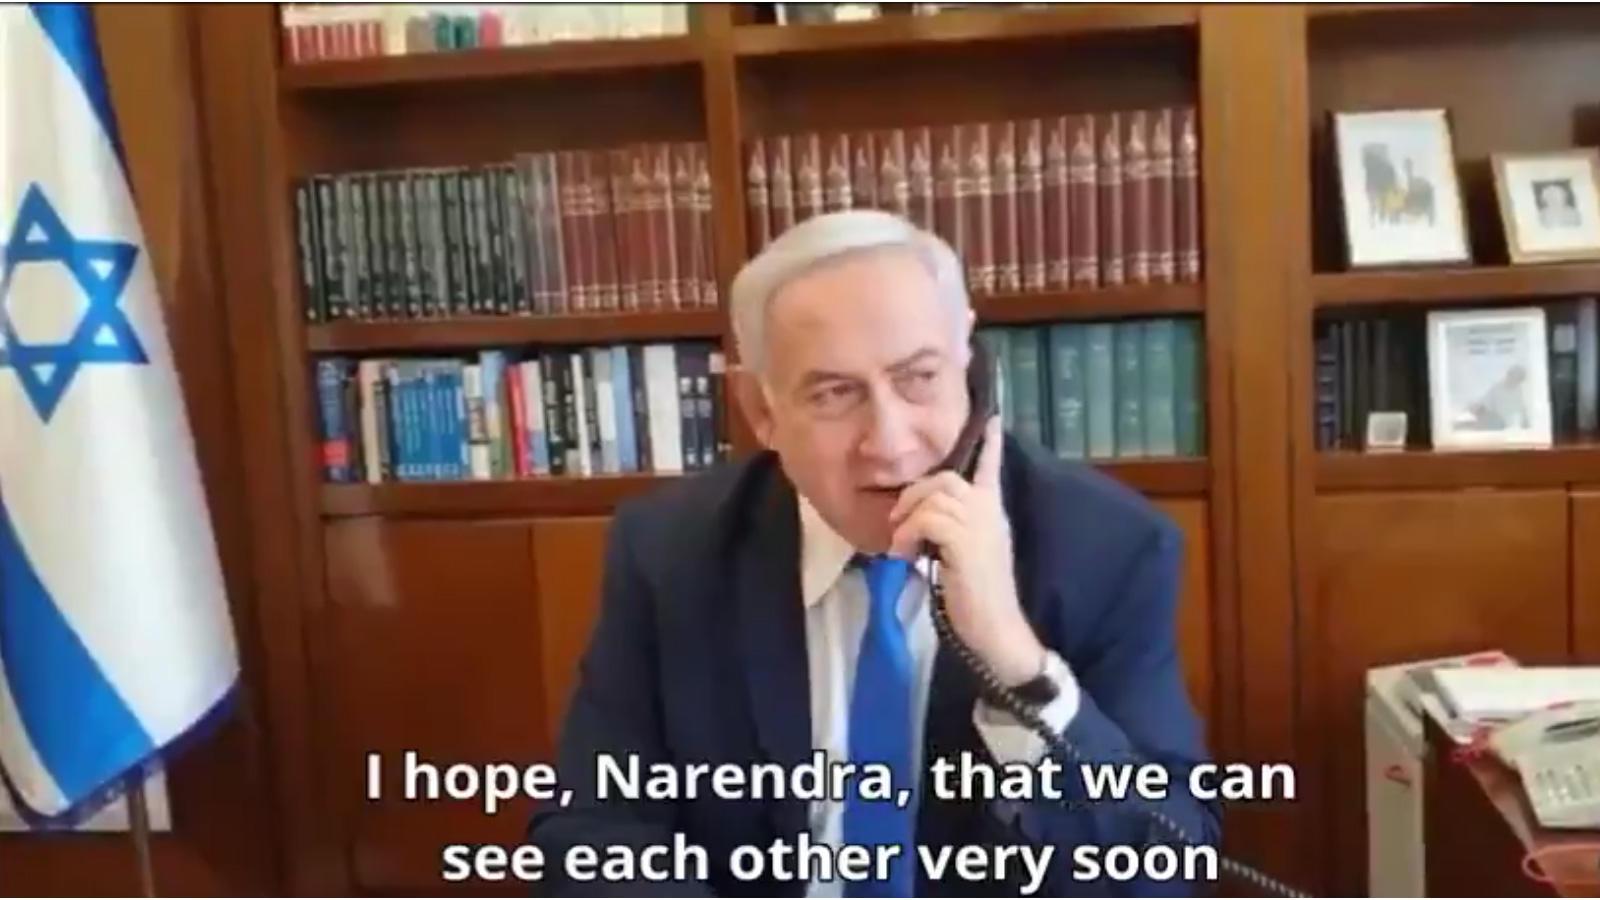 israel-pm-benjamin-netanyahu-congratulates-narendra-modi-over-telephonic-conversation